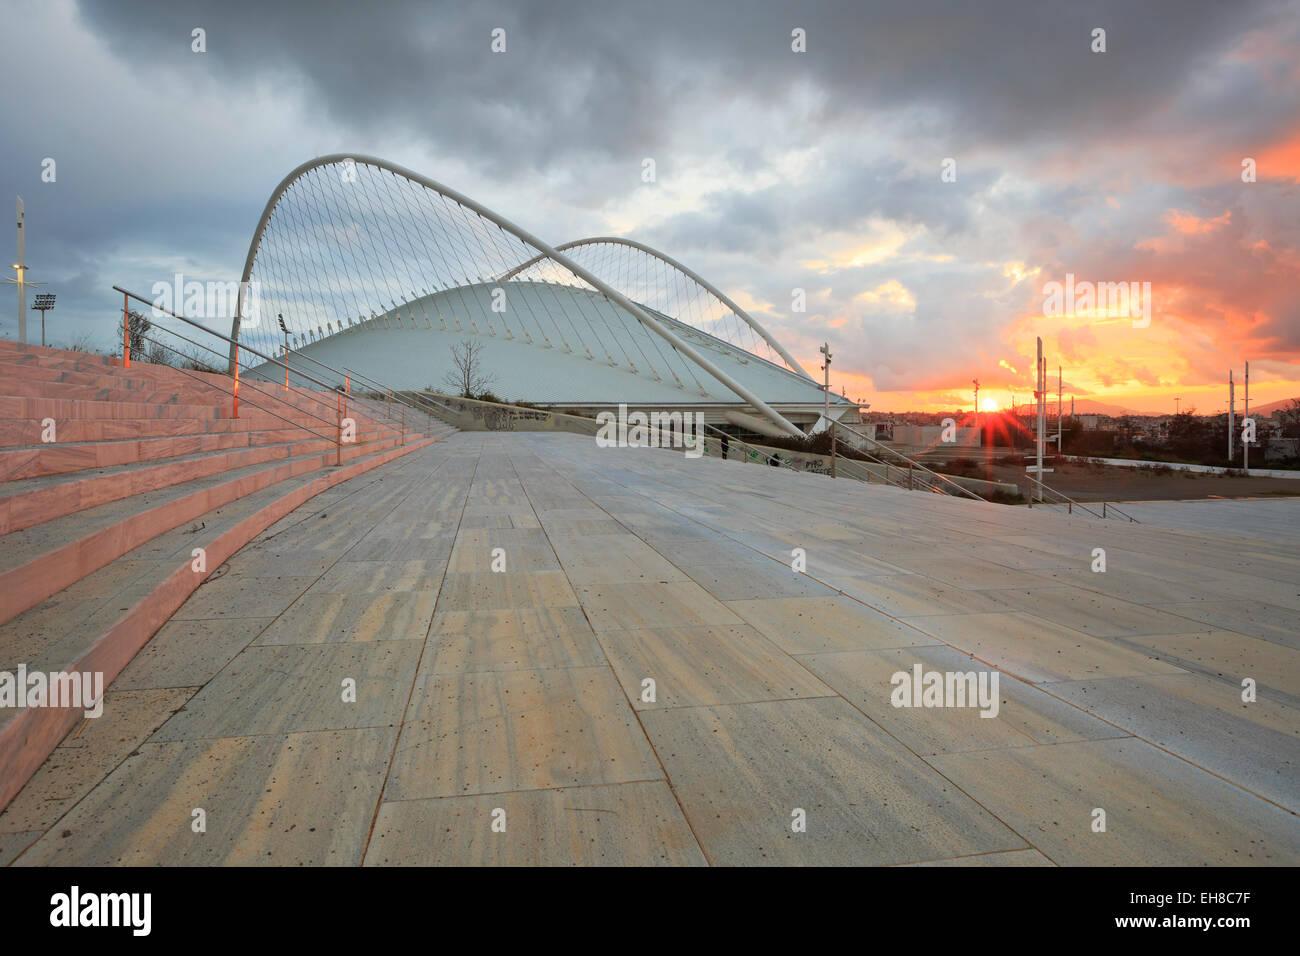 The Olympic Velodrome stadium in Athens - Stock Image